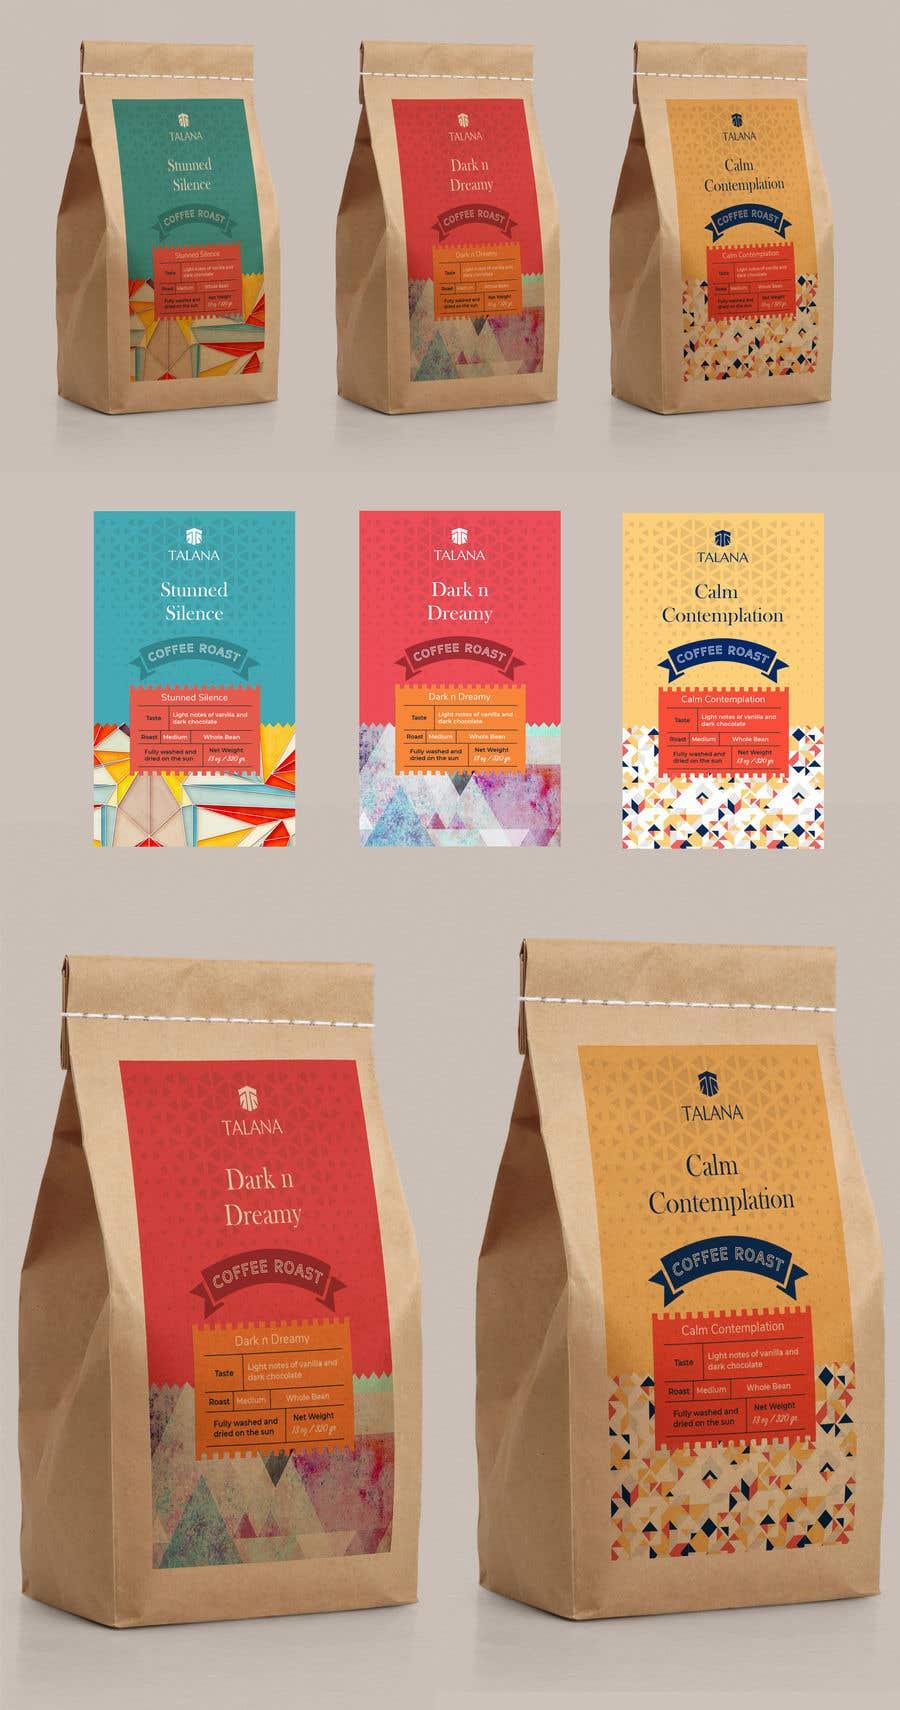 Kilpailutyö #                                        136                                      kilpailussa                                         Talana Coffee package label design